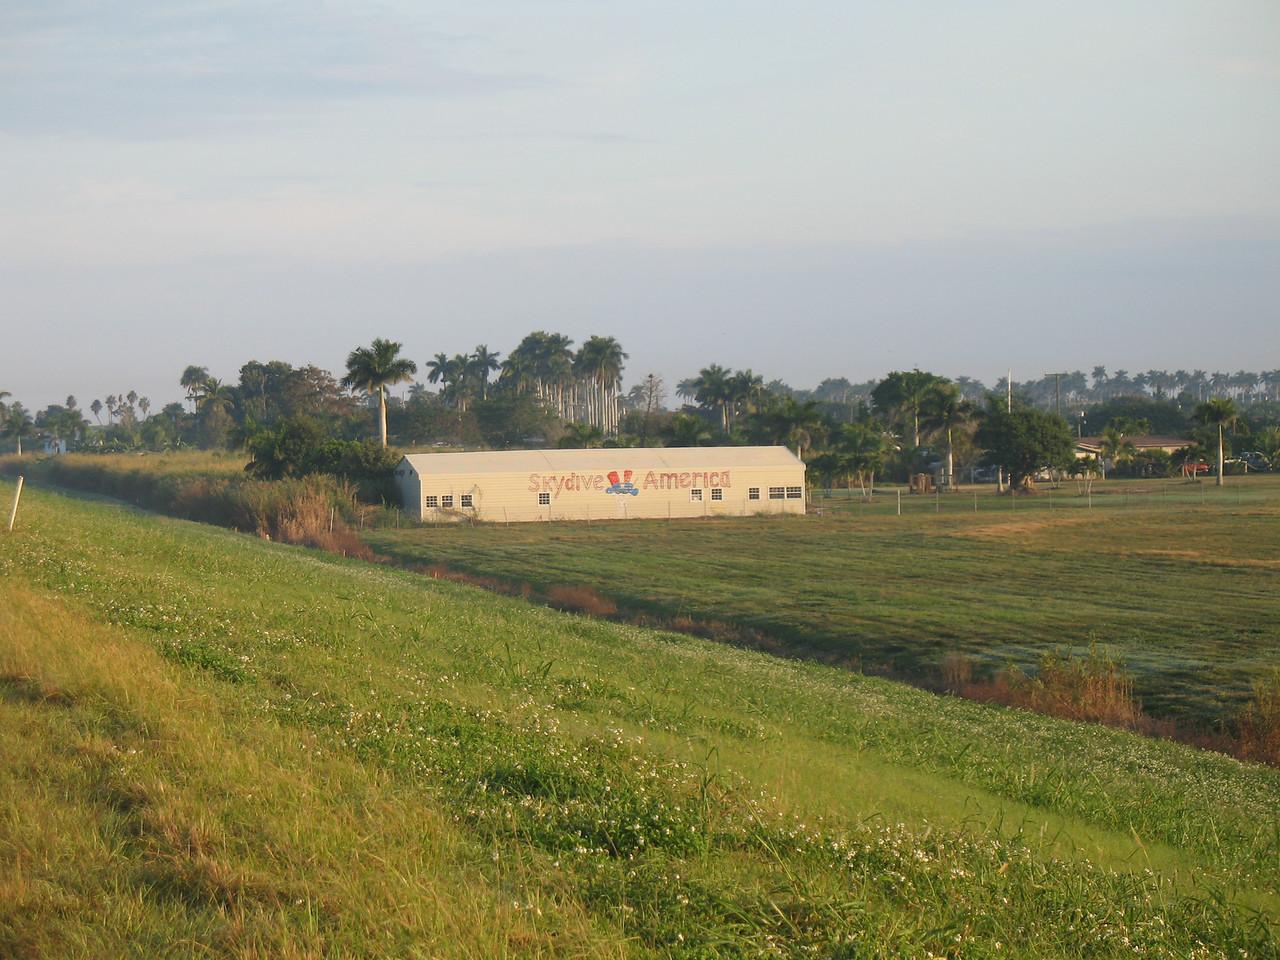 Royal palms at the south edge of Pahokee, near the airport (Sandra Friend)